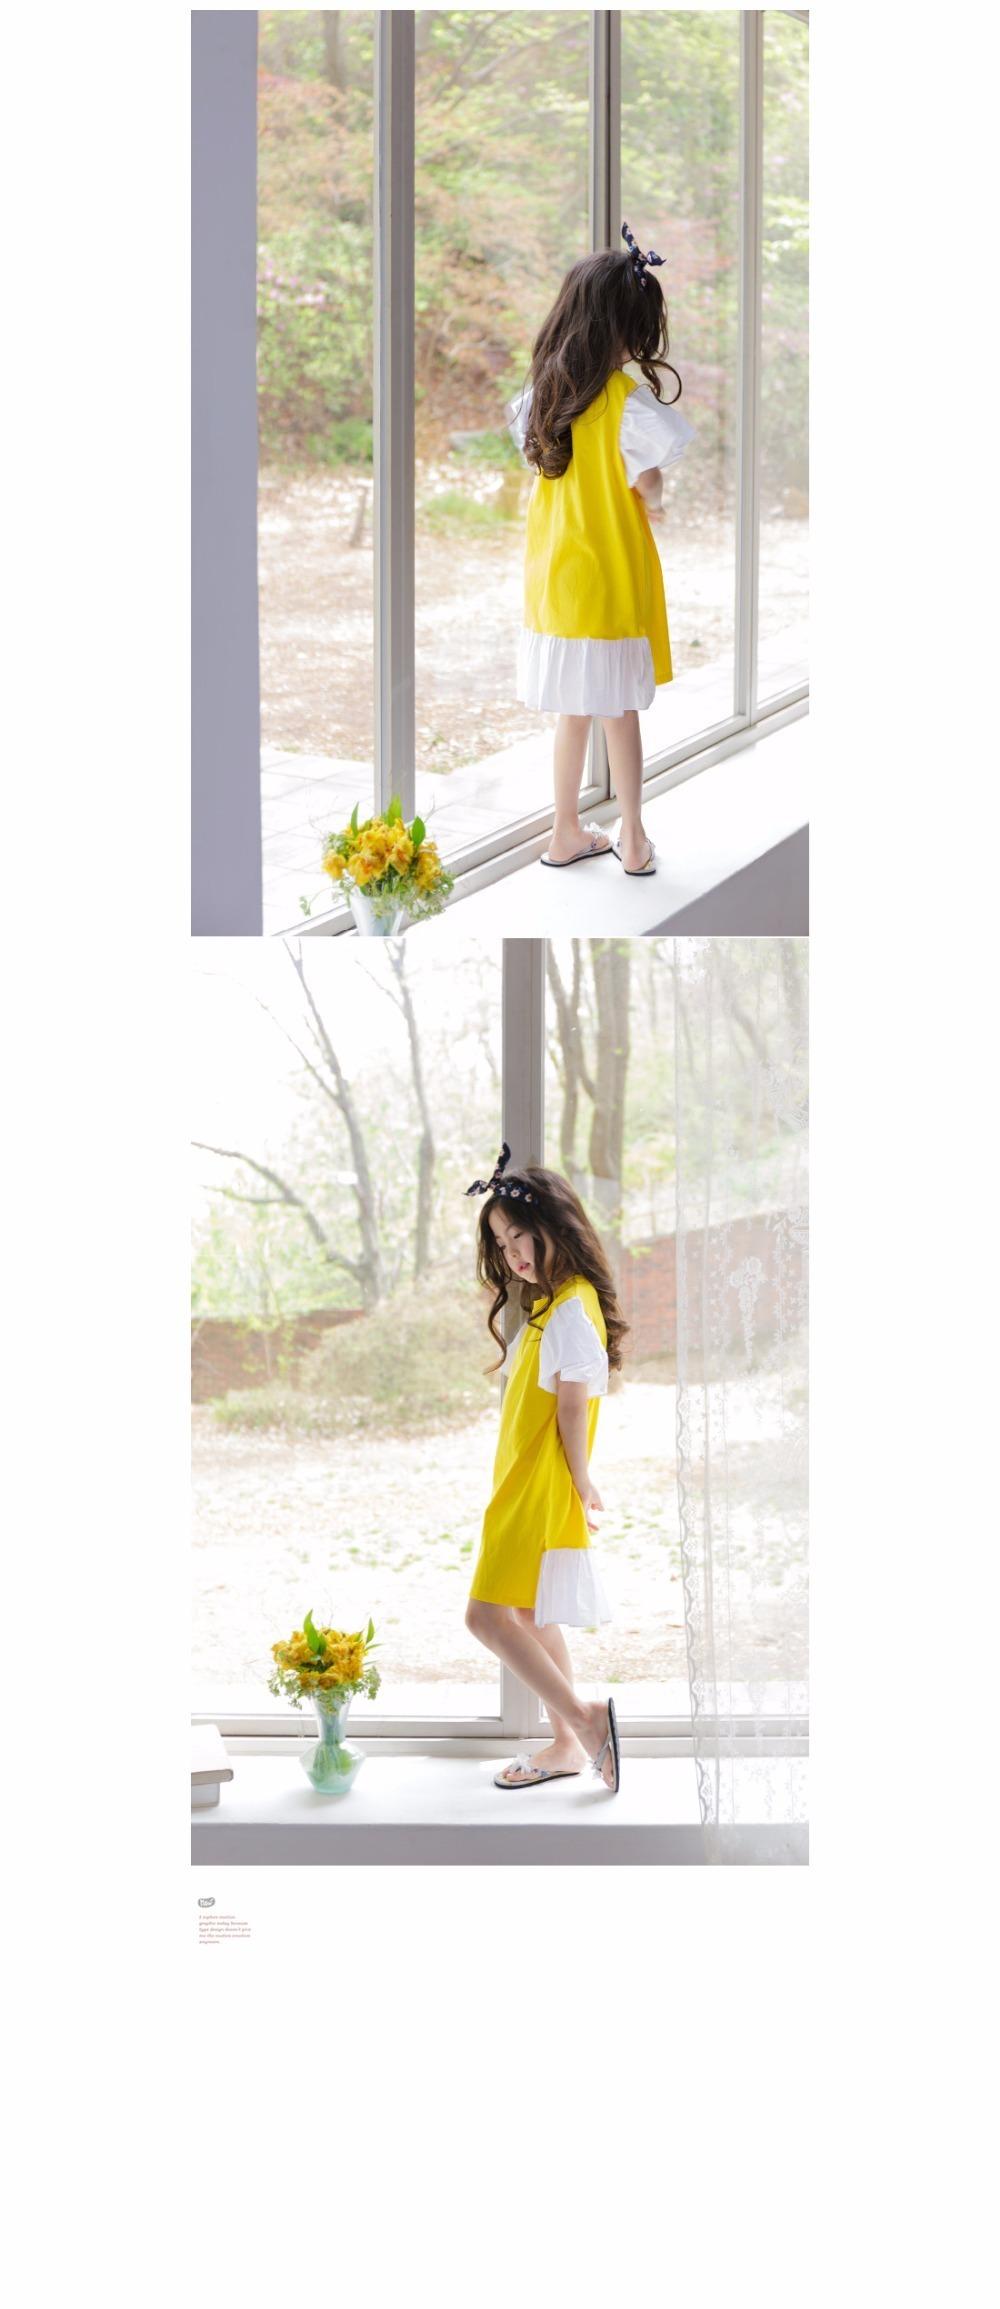 ruffles patchwork little big girl dresses cotton summer 2017 yellow knee legnth kids dresses designs Children Boutique Clothes 4 5 6 7 8 9 10 11 12 13 14 years old little big teenage girls dresses summer dress girl kids 2017 (5)